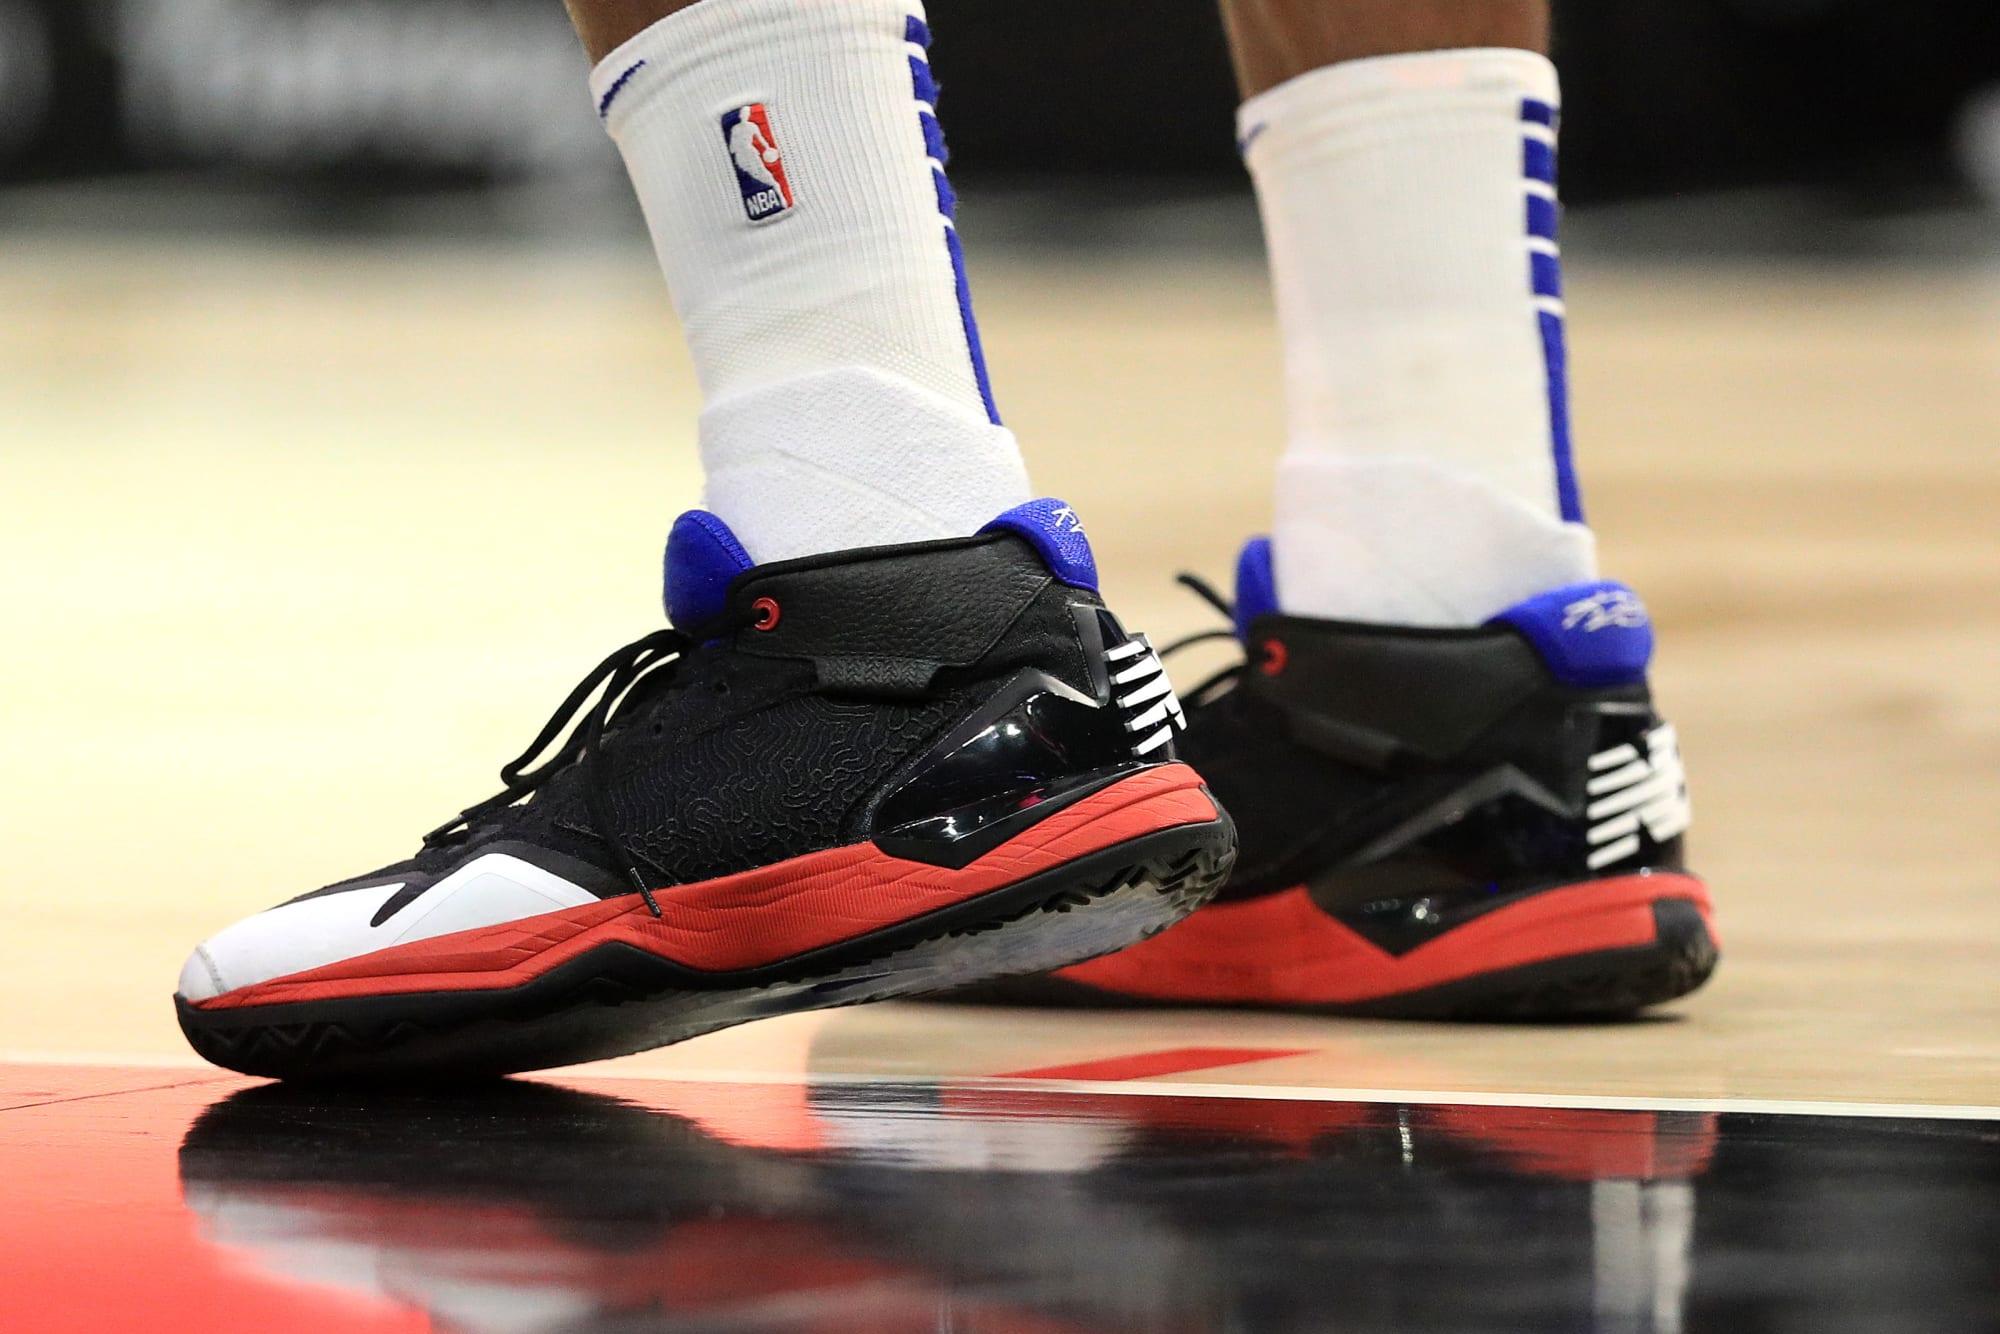 Clippers' Kawhi Leonard's sneaker brand, New Balance partners with NBA